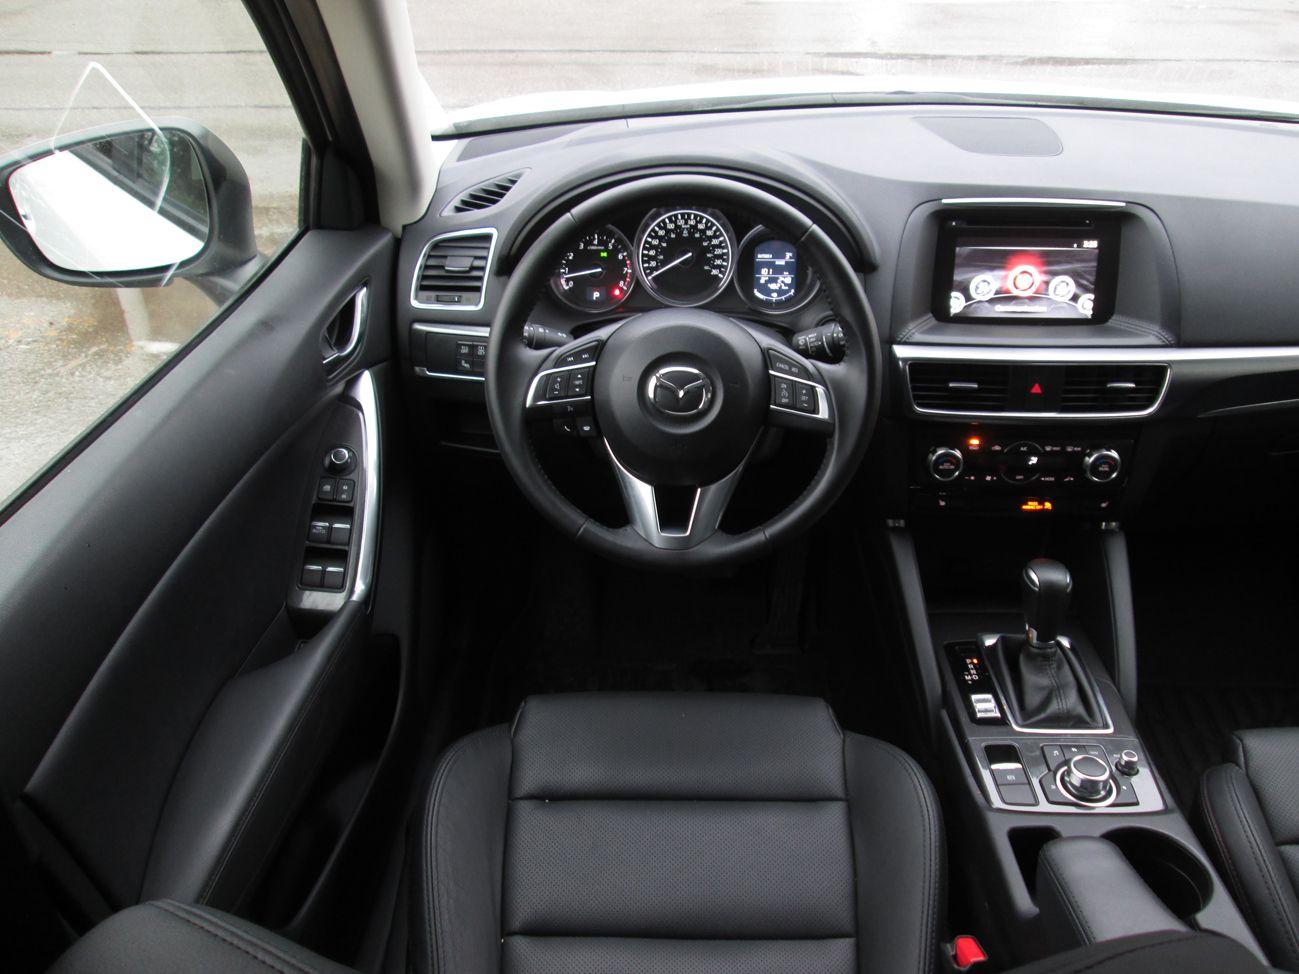 Mazda Cx 5 2013 2016 Problems And Fixes Fuel Economy Driving Experience Photos Mazda Cx5 Mazda Fuel Economy